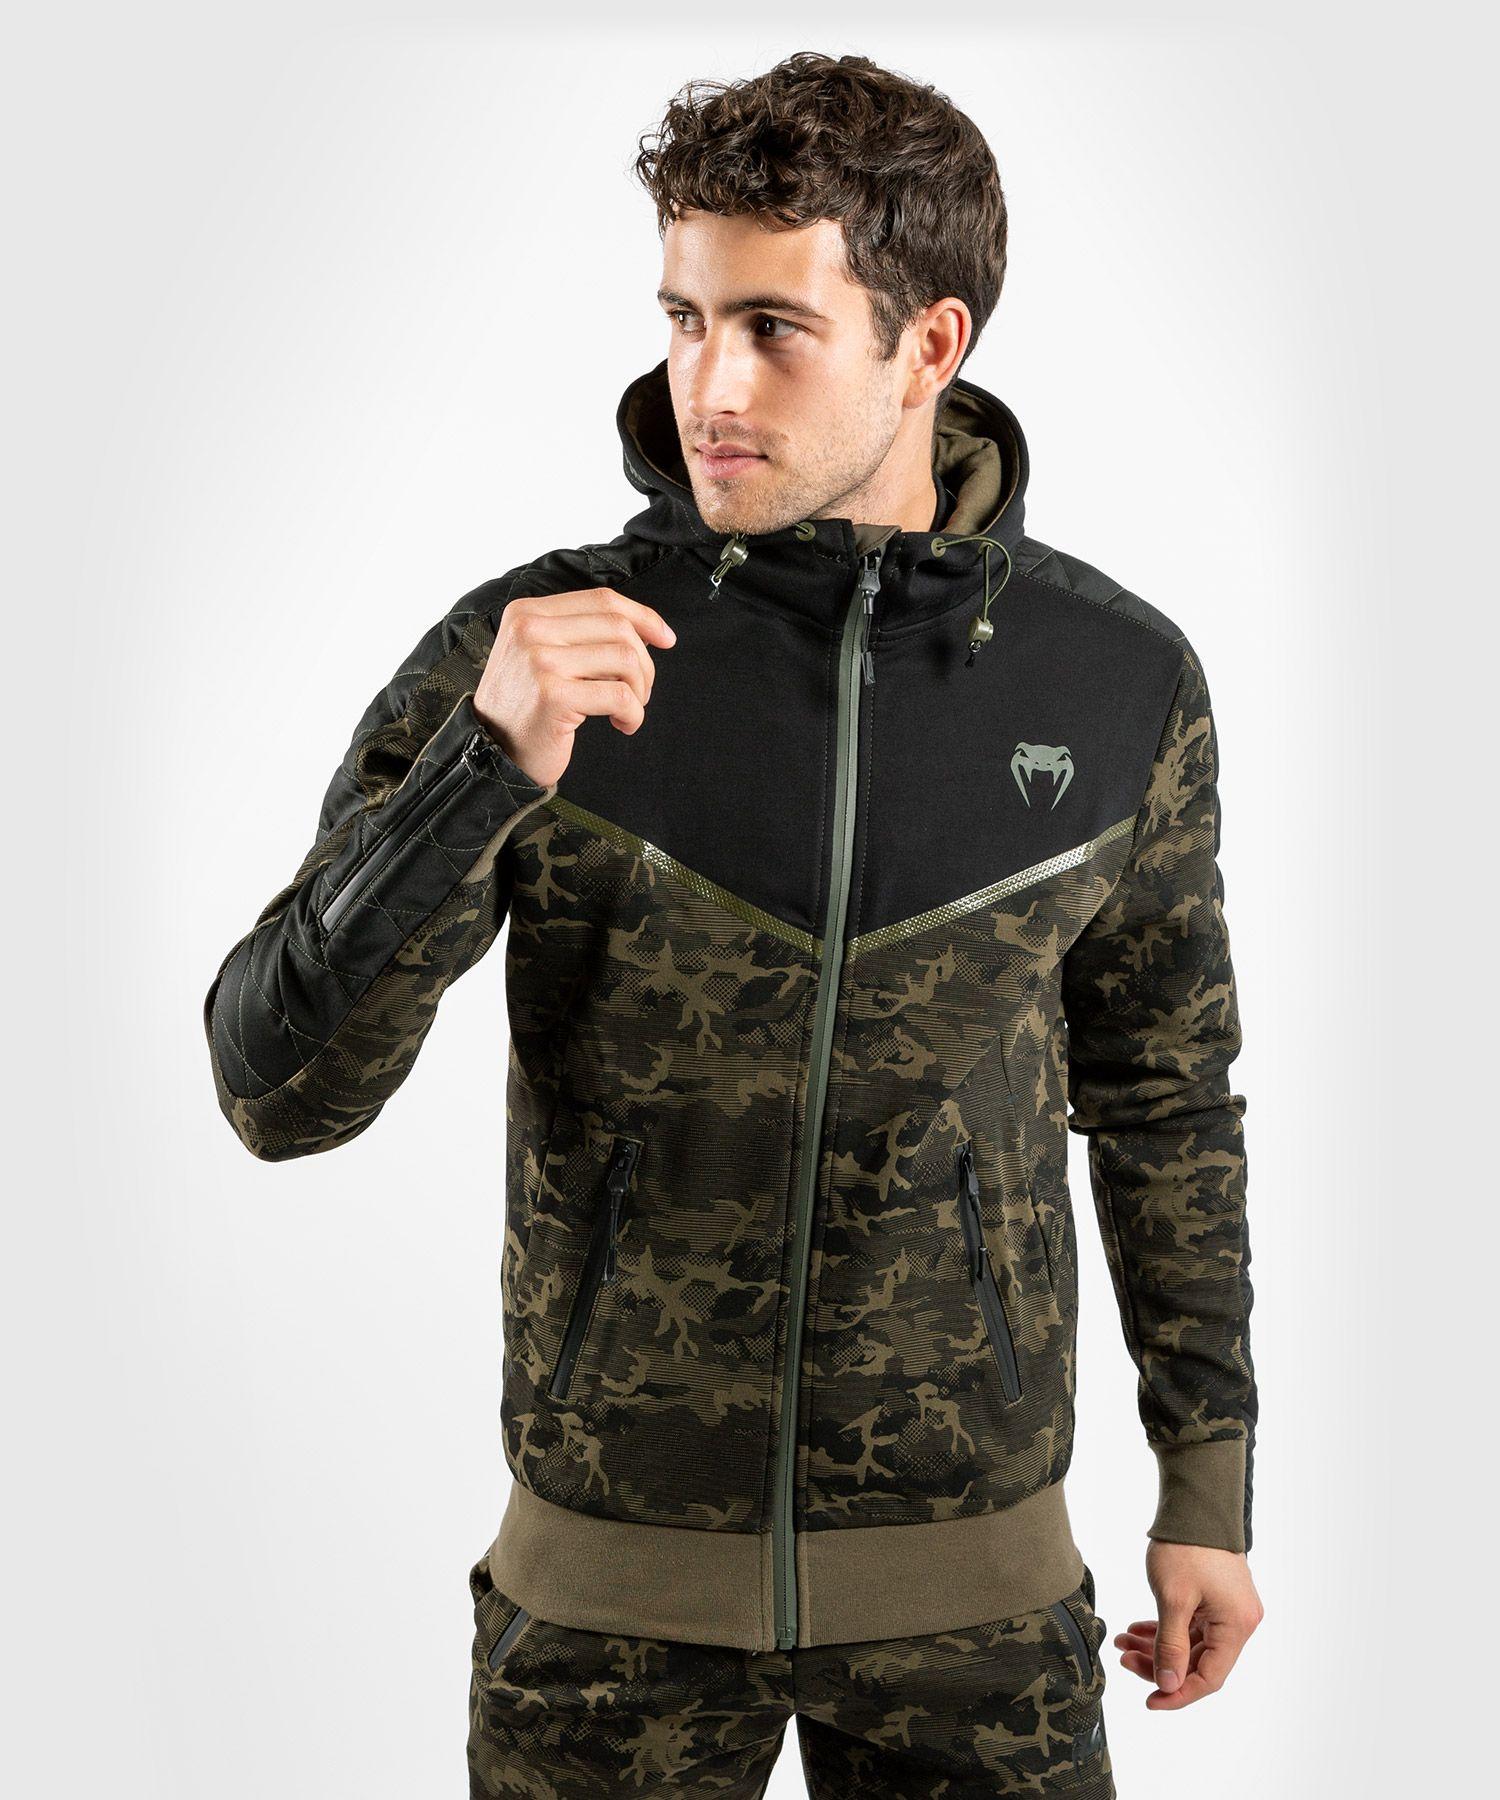 Sweatshirt Venum Laser EVO - Khaki Camo